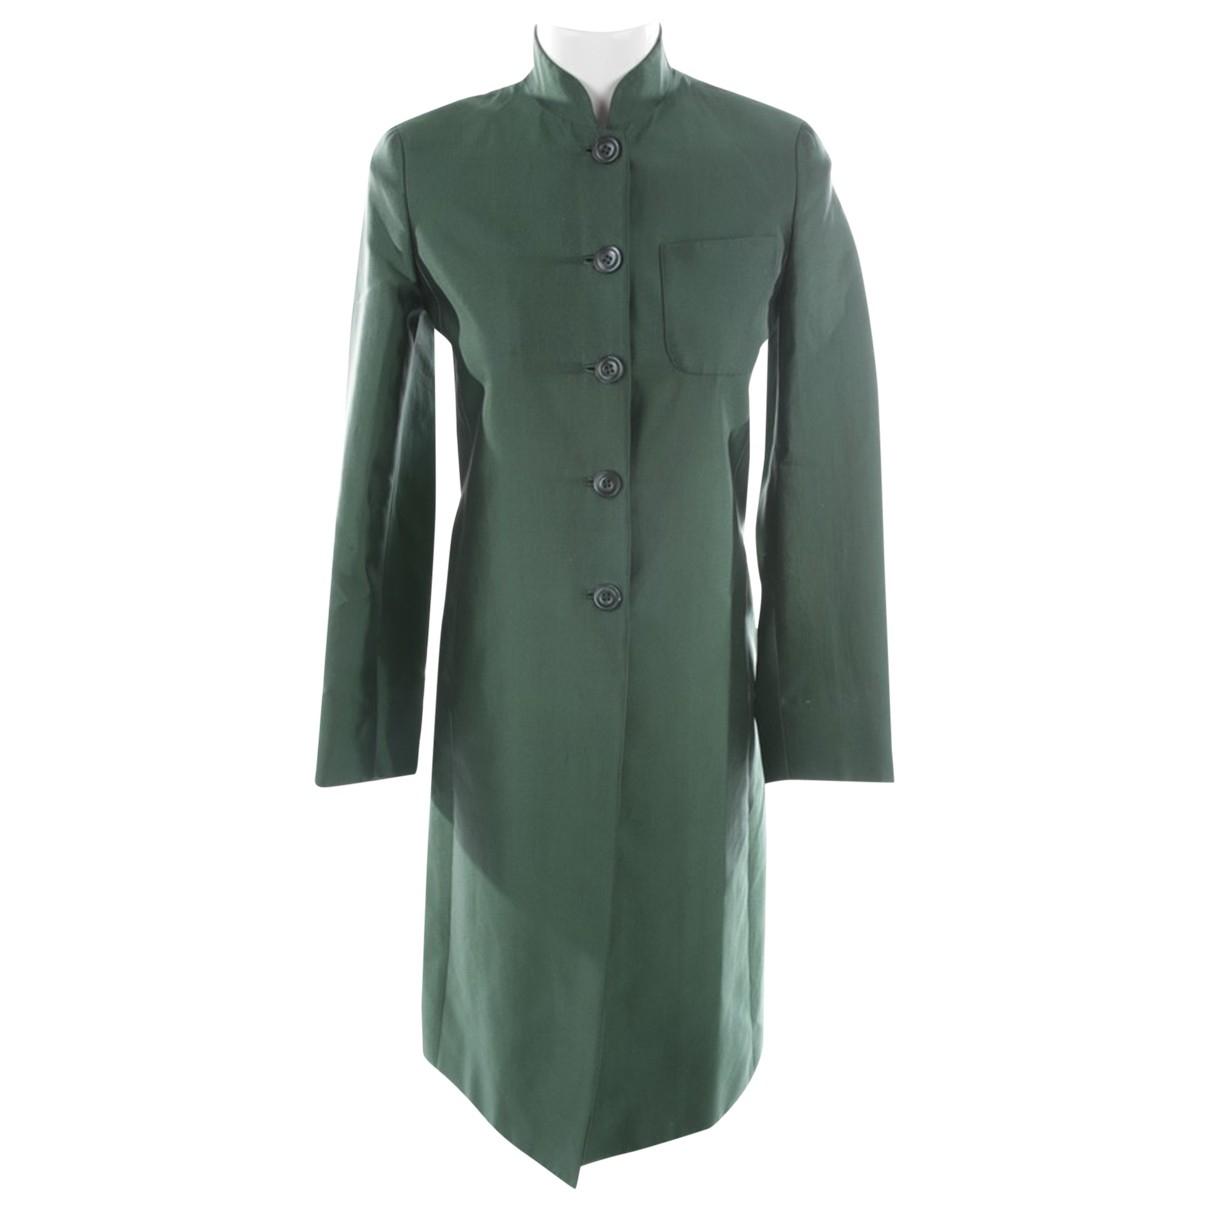 Prada \N Green Cotton jacket for Women 34 FR